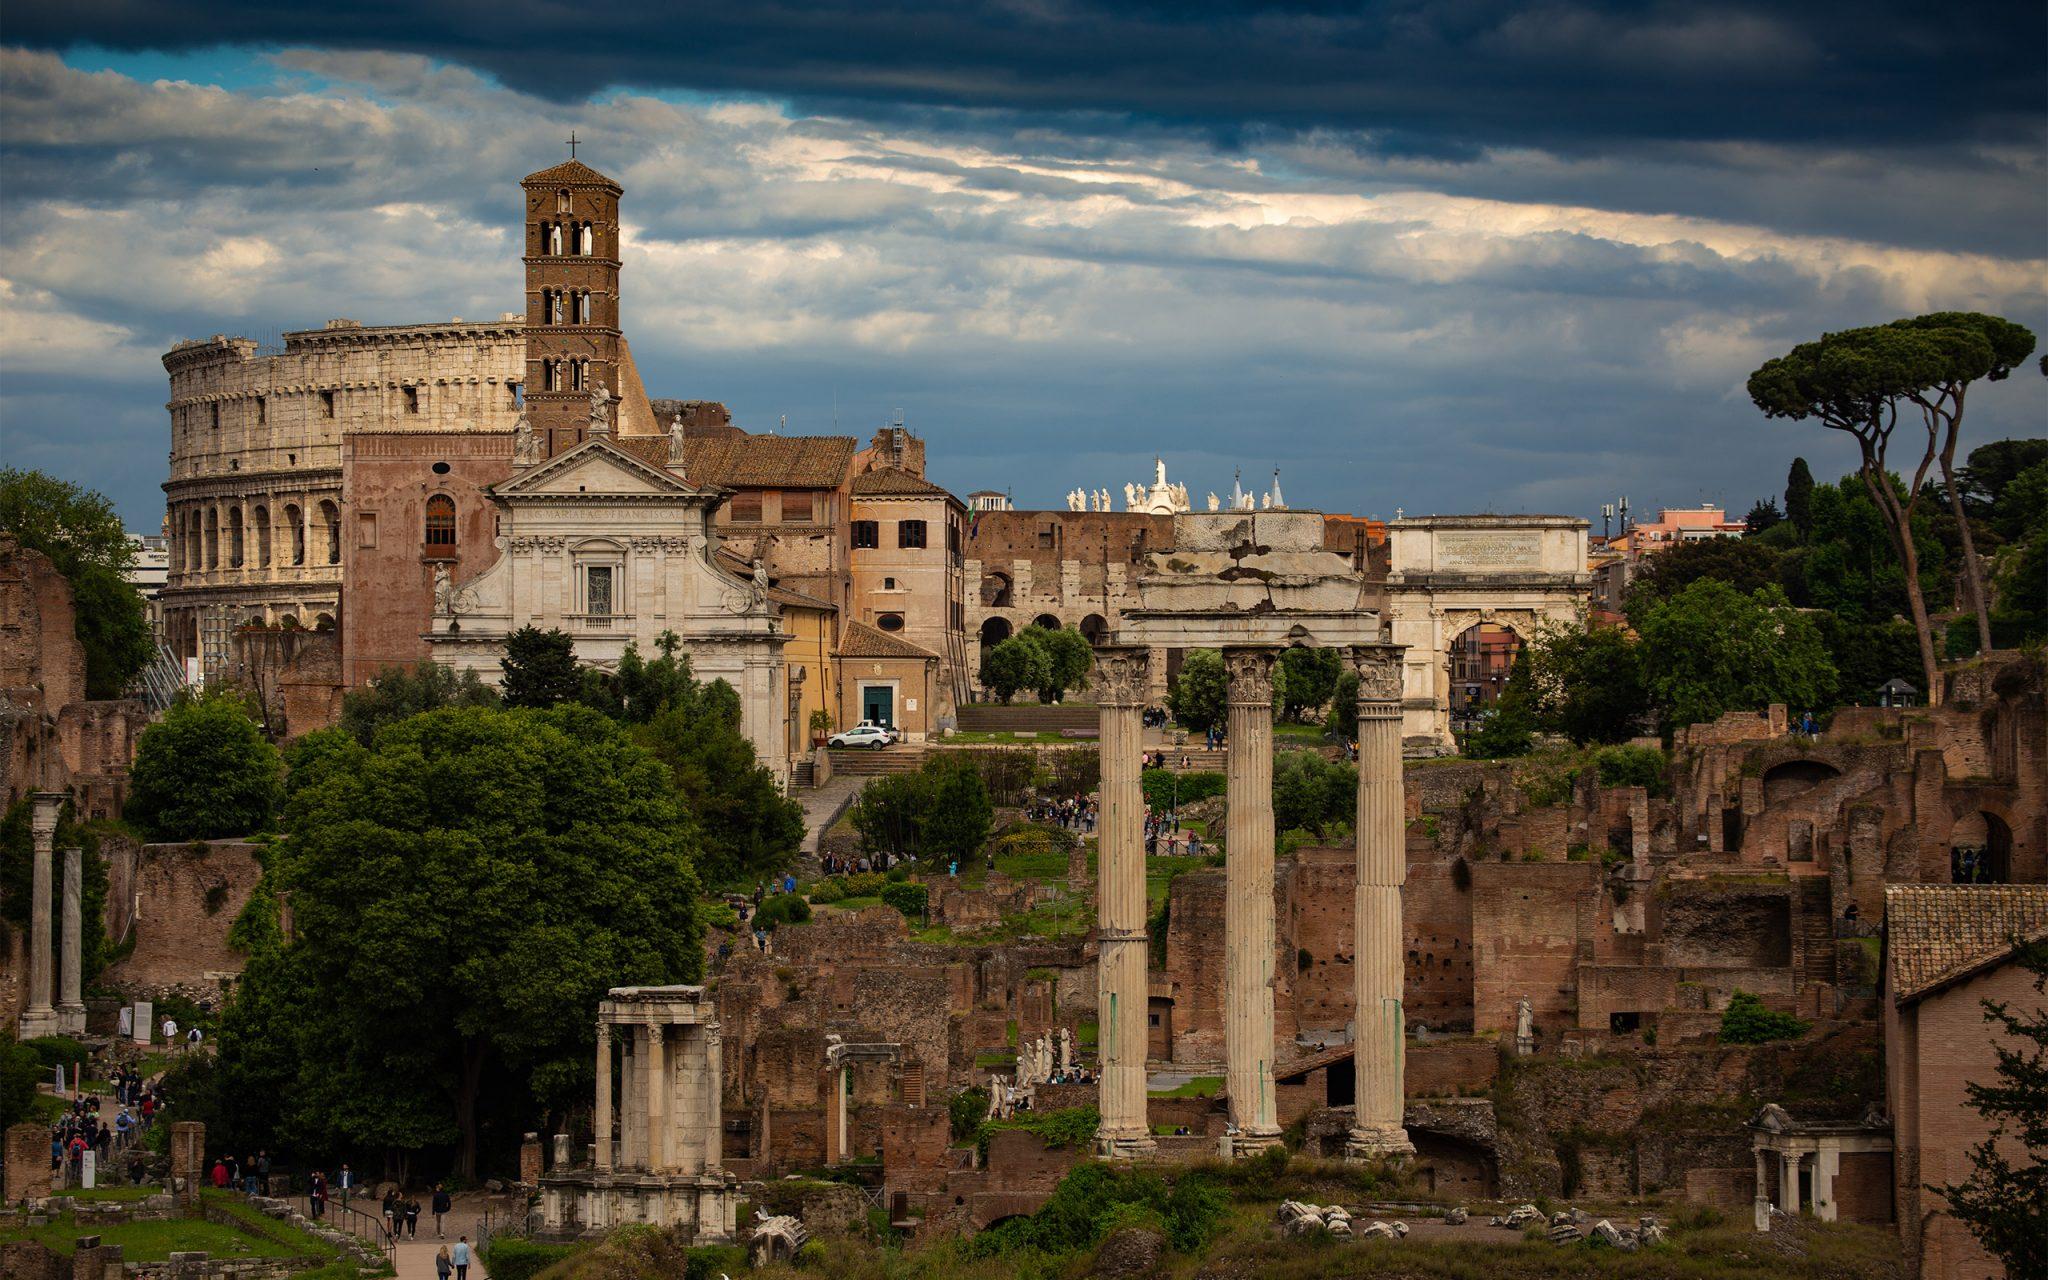 Global Symposium on Soil Erosion, FAO, UNFAO, United Nations, Eternal City of Rome, Circo Massimo, Palatine Hill, Roman Forum.